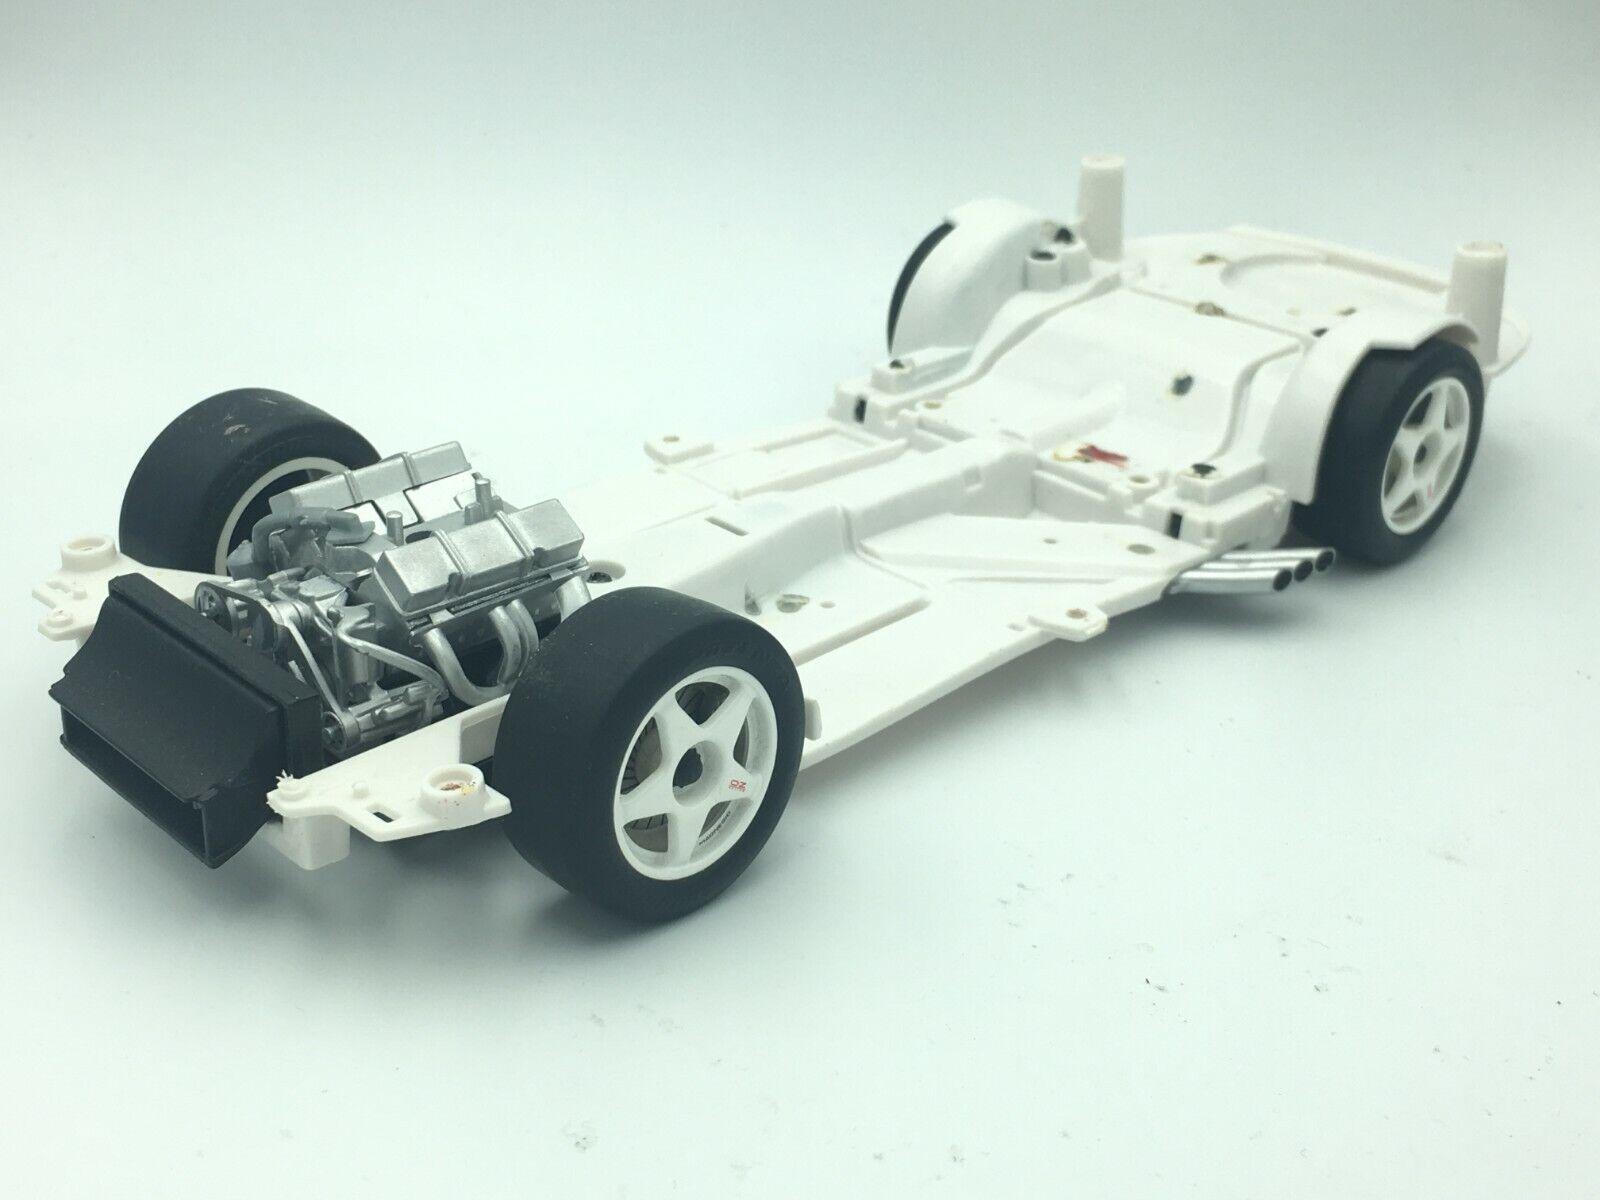 acquistare ora 1 18 HRT Rolling Chassis -- 2000 Holden Racing Racing Racing squadra Mark Skaife  grandi risparmi